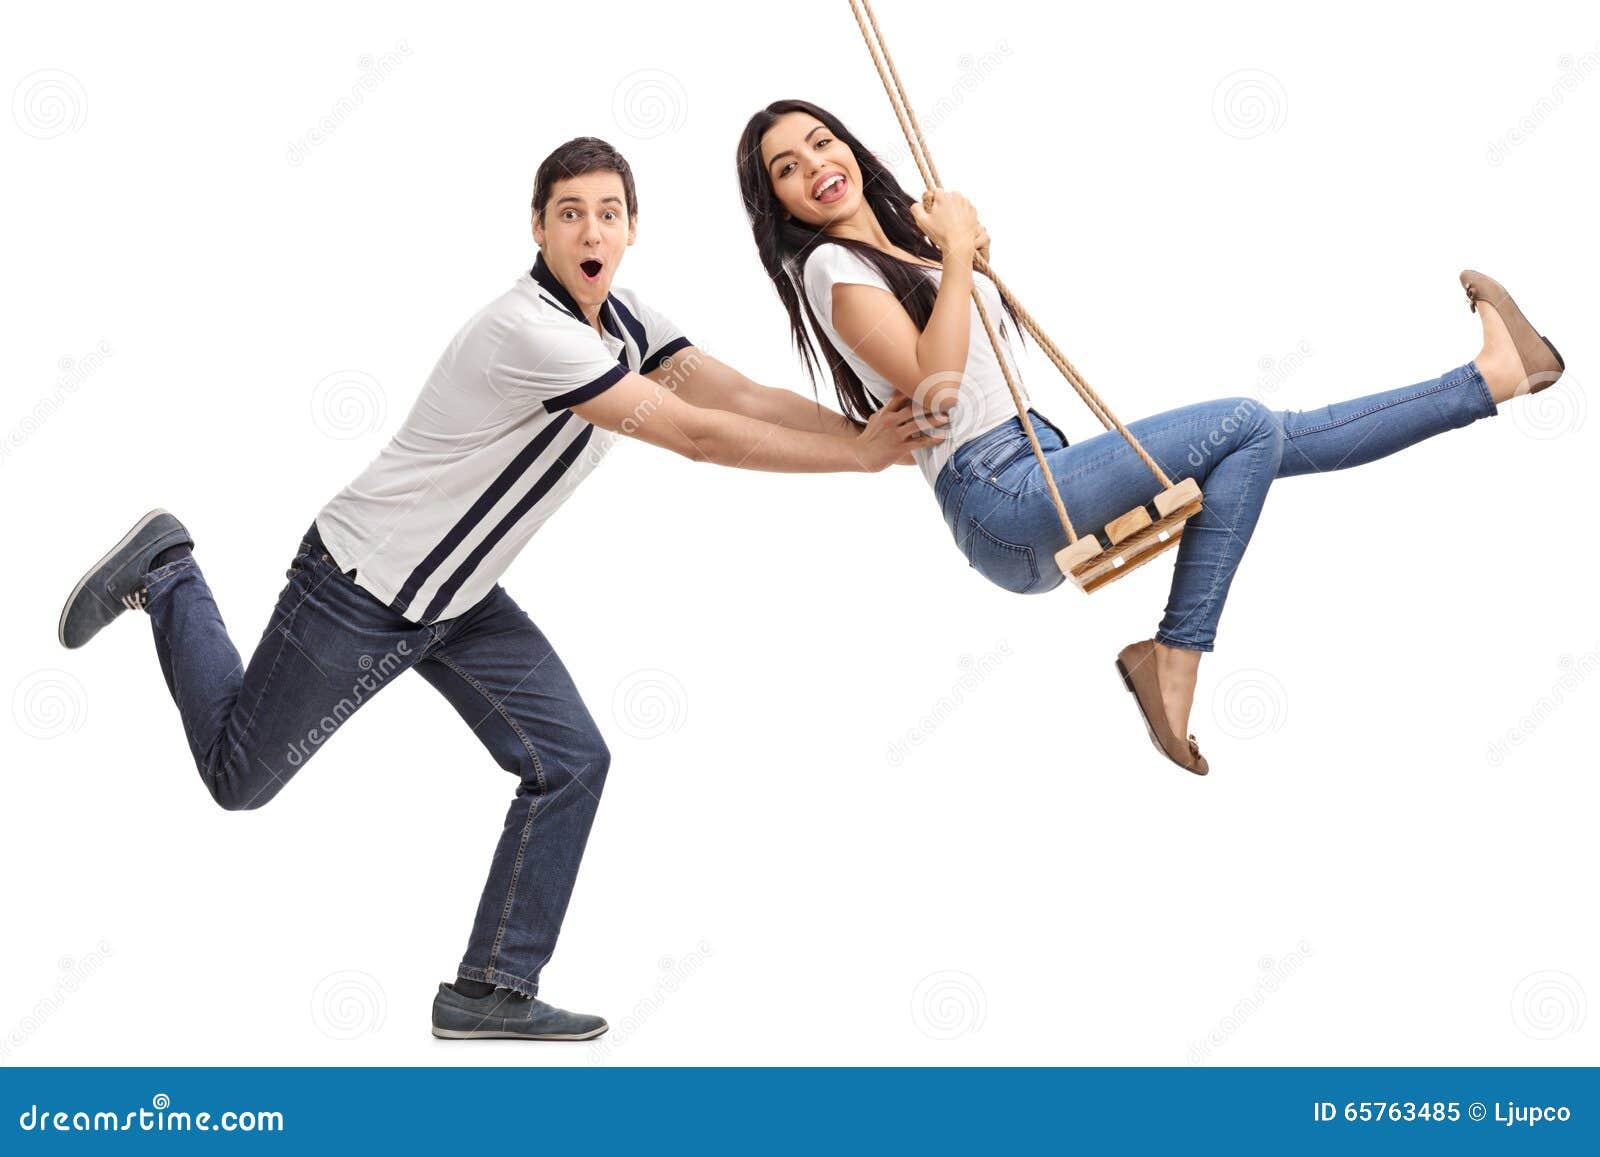 Adult swinging personal something